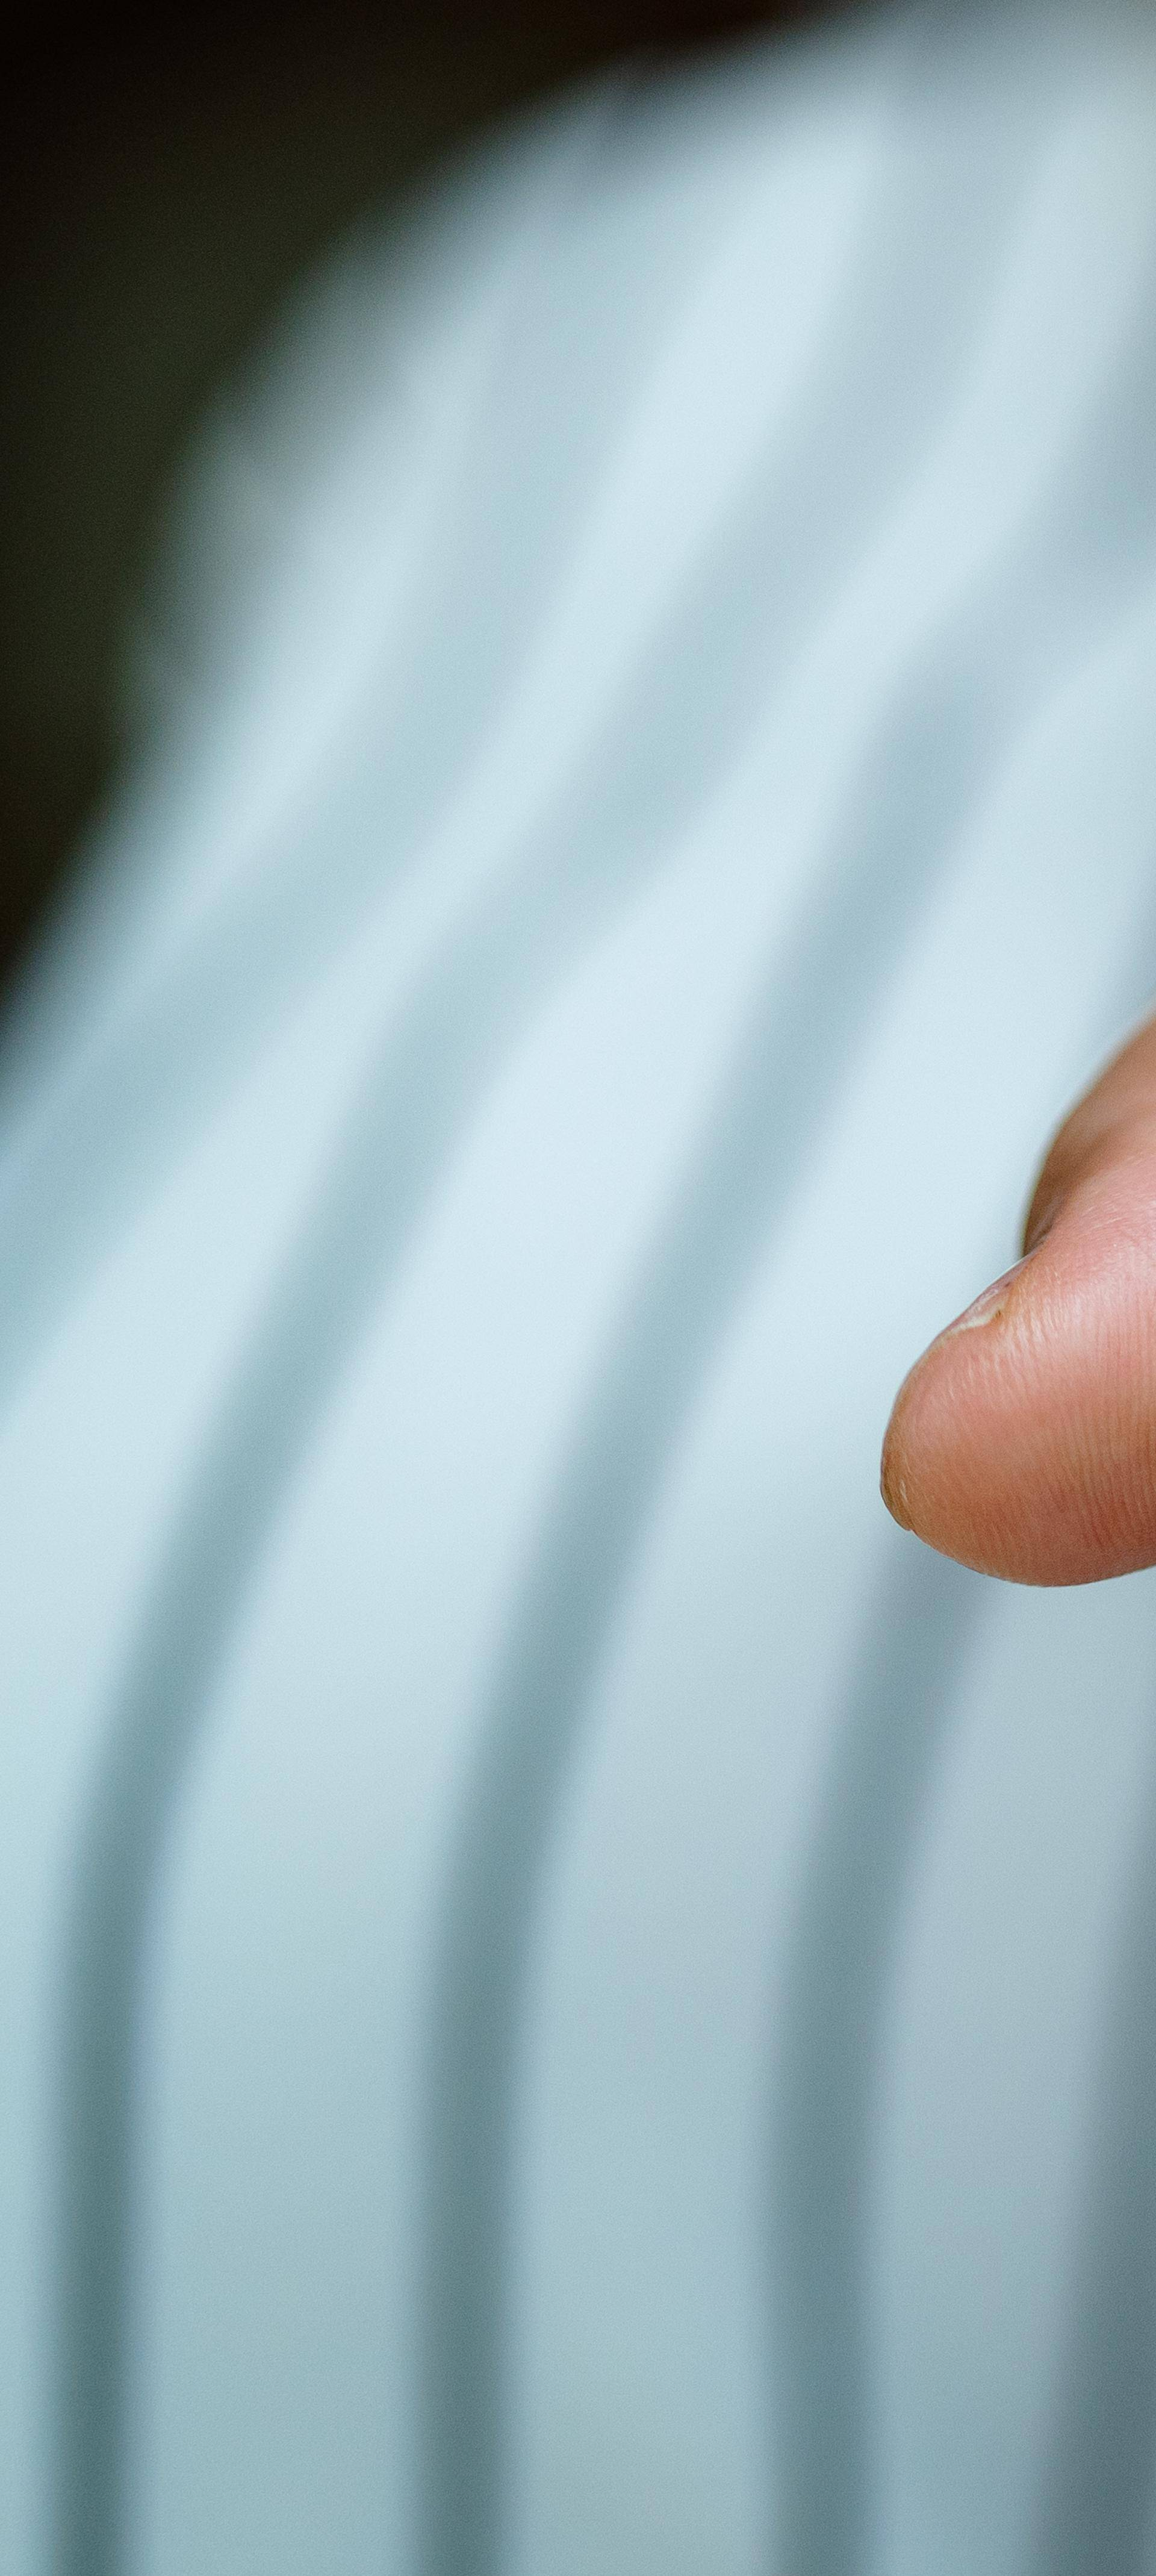 5 rješenja za lomljive nokte: Idealna ulja, hrana, pilinzi i gel